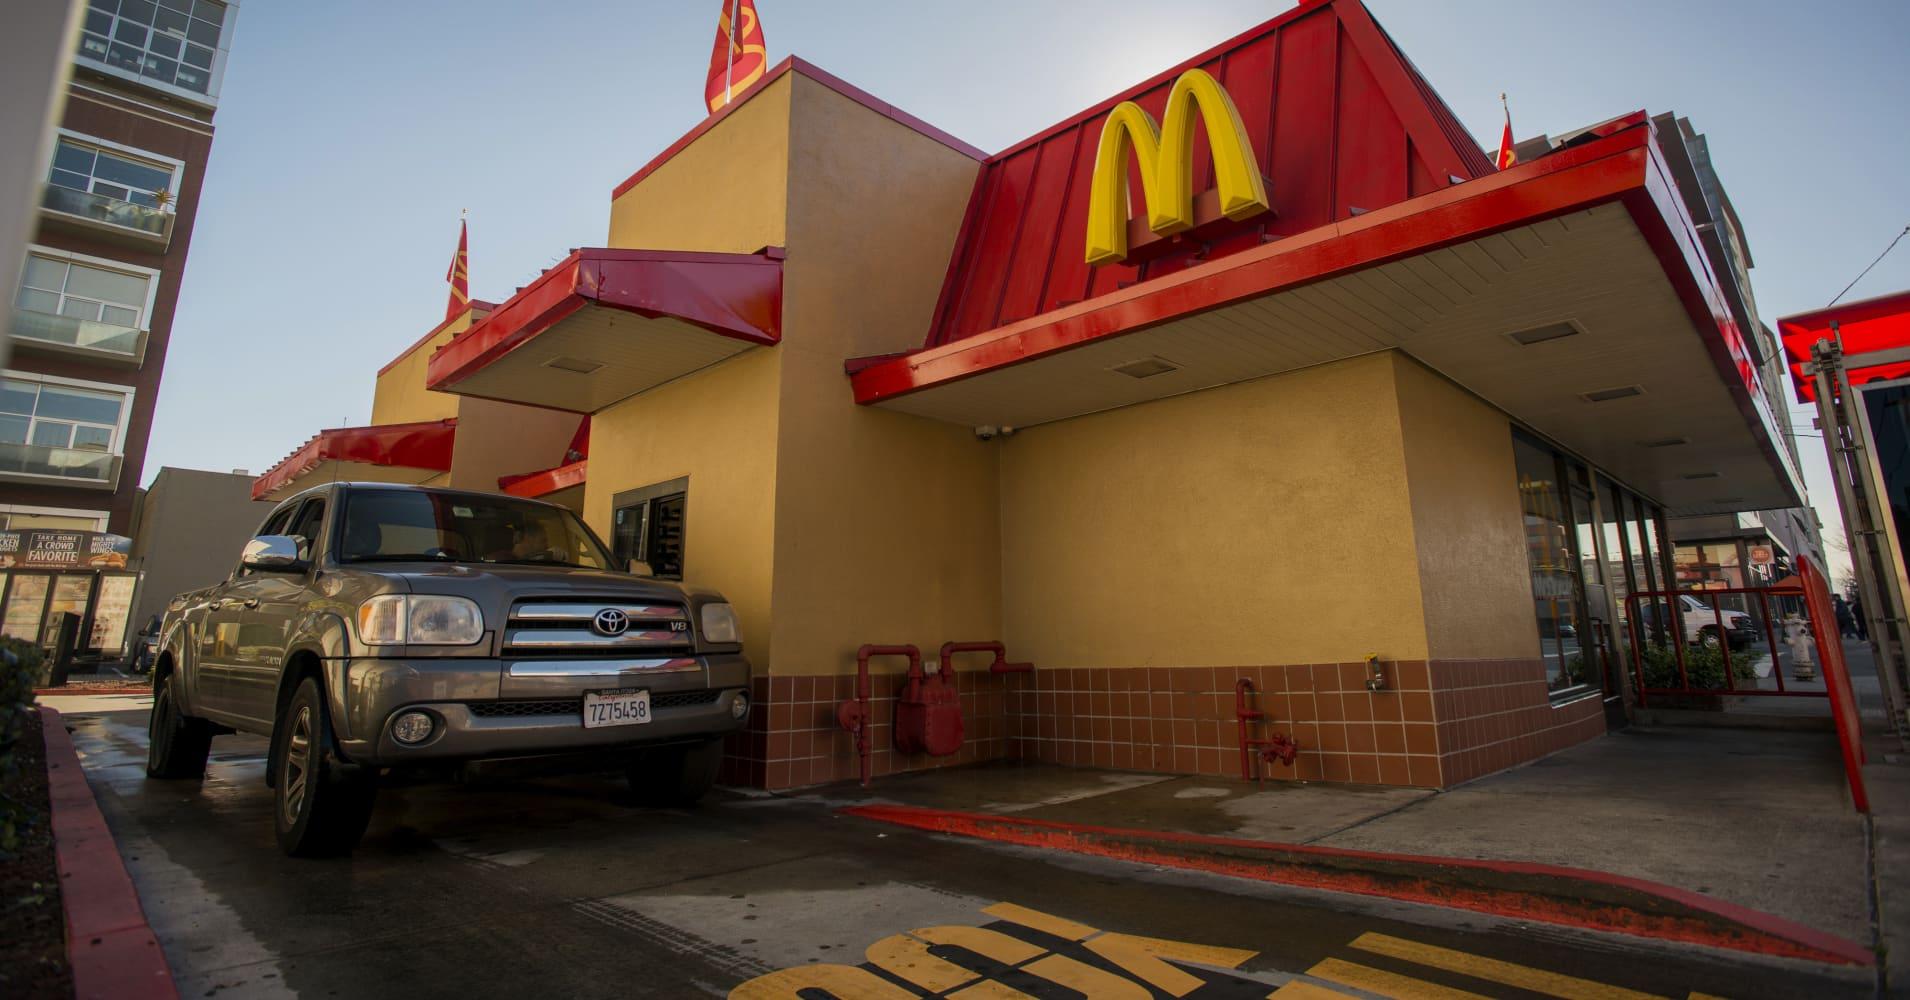 McDonald's announces acquisition to personalize the drive thru